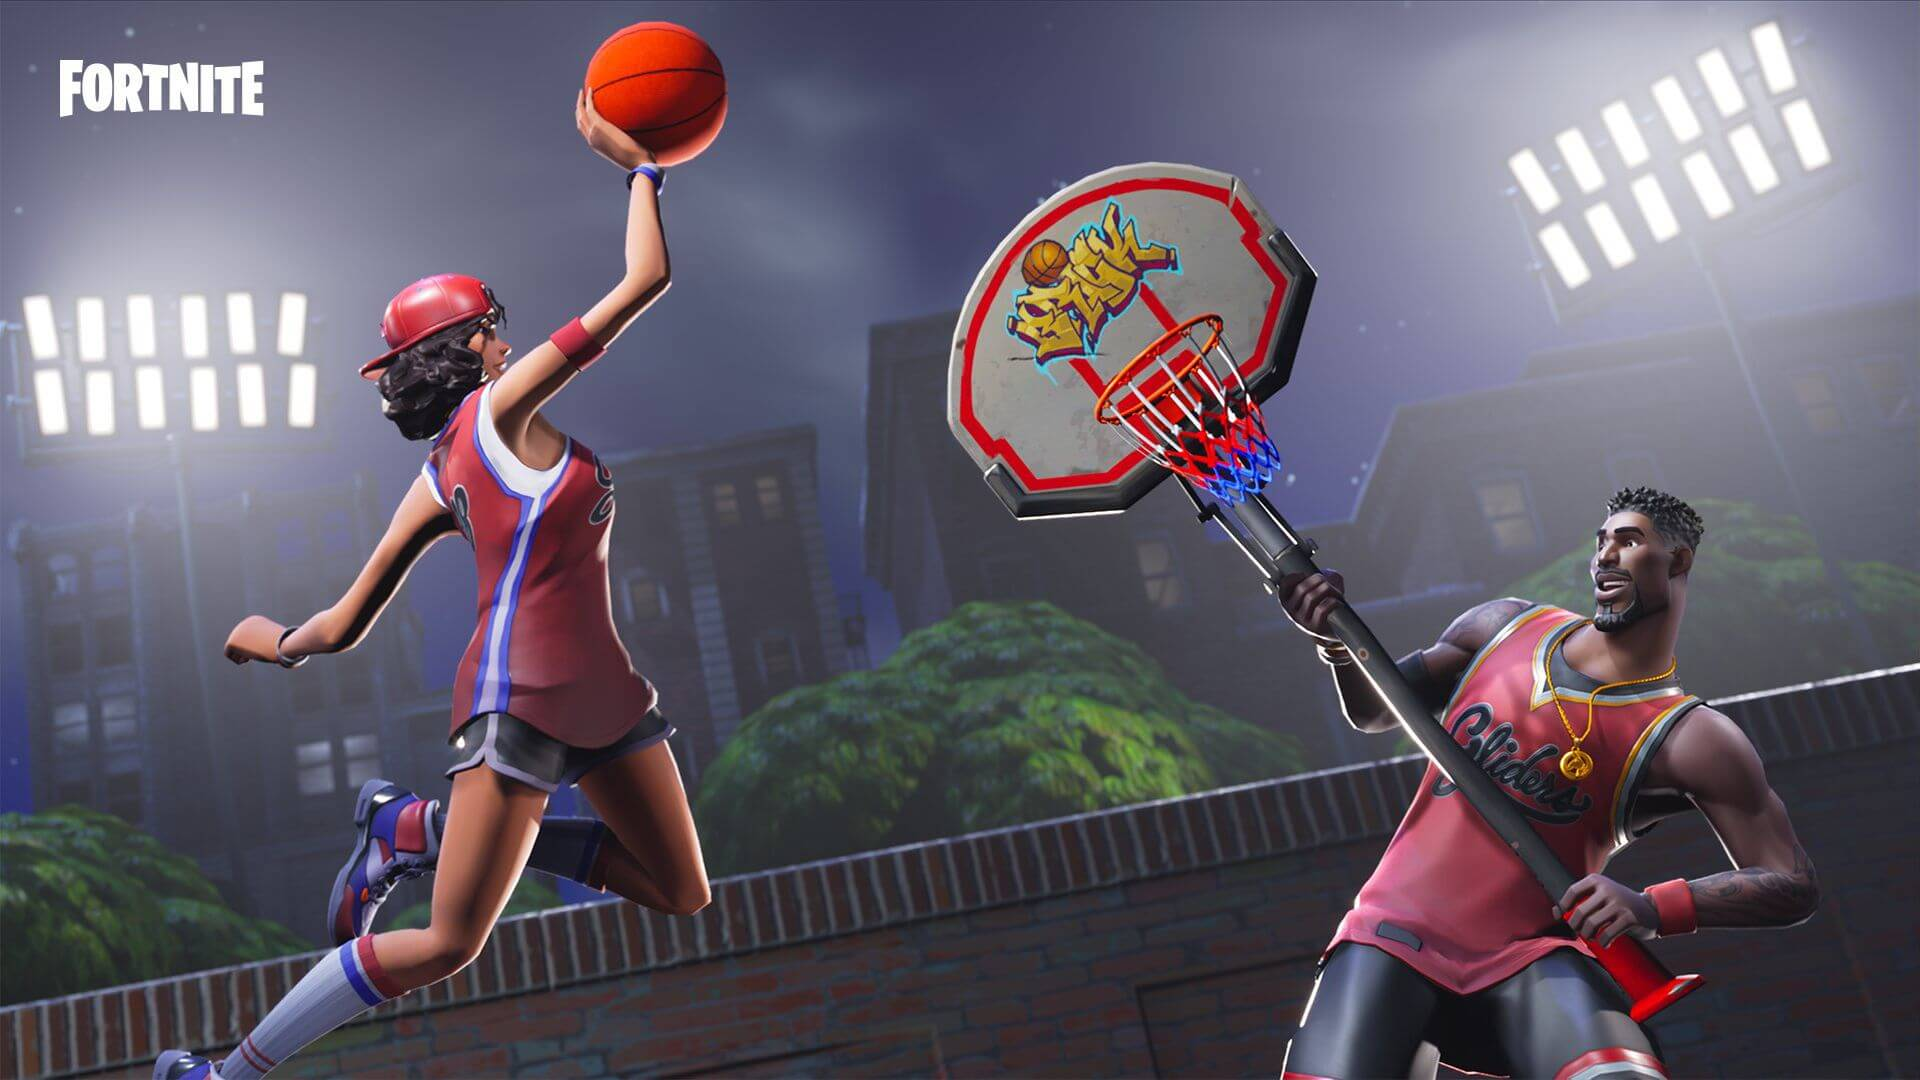 Fortnite NBA crossover latest updates